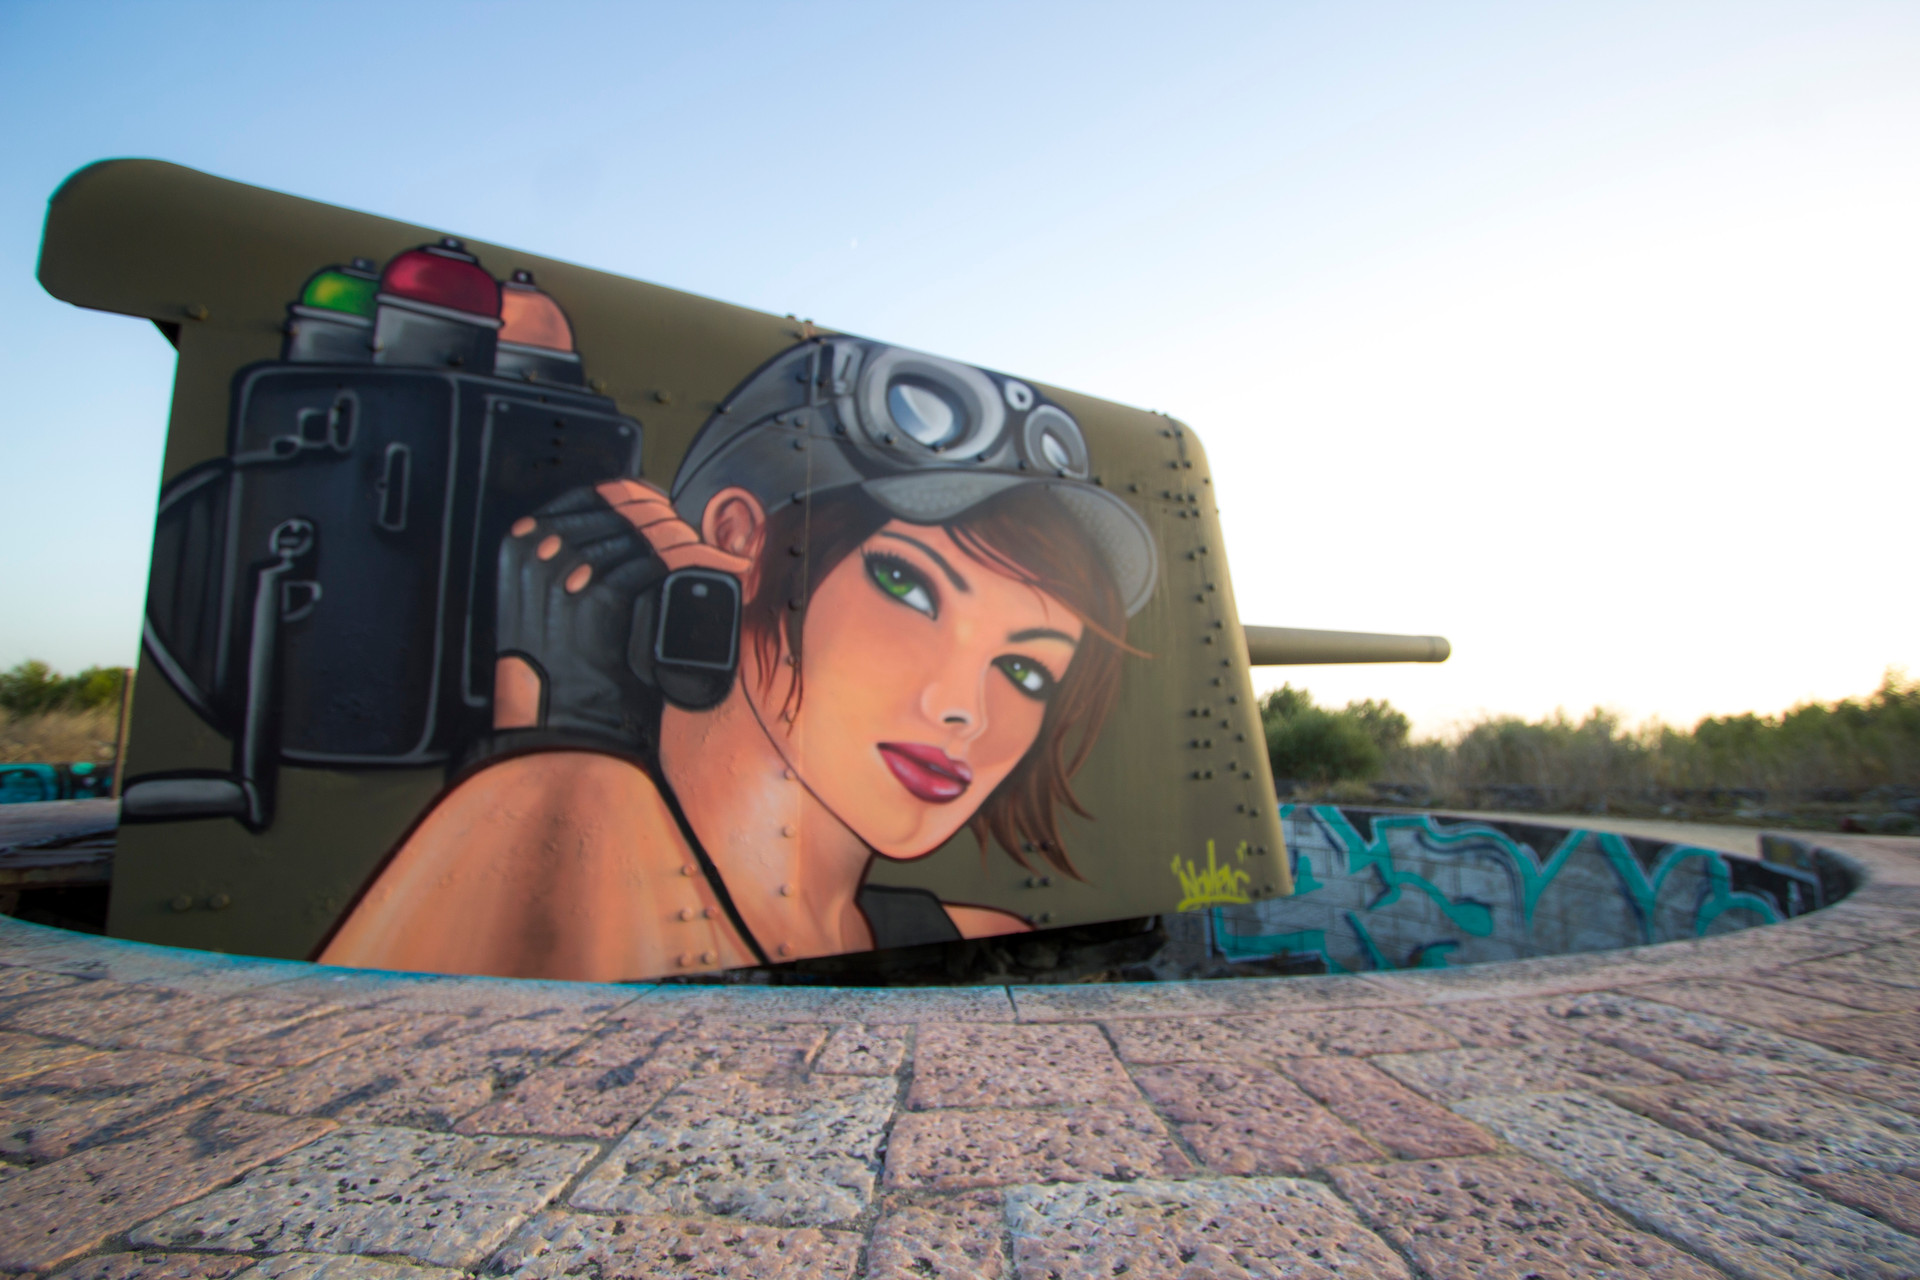 Pintura de Nomen sobre Canhão de Guerra